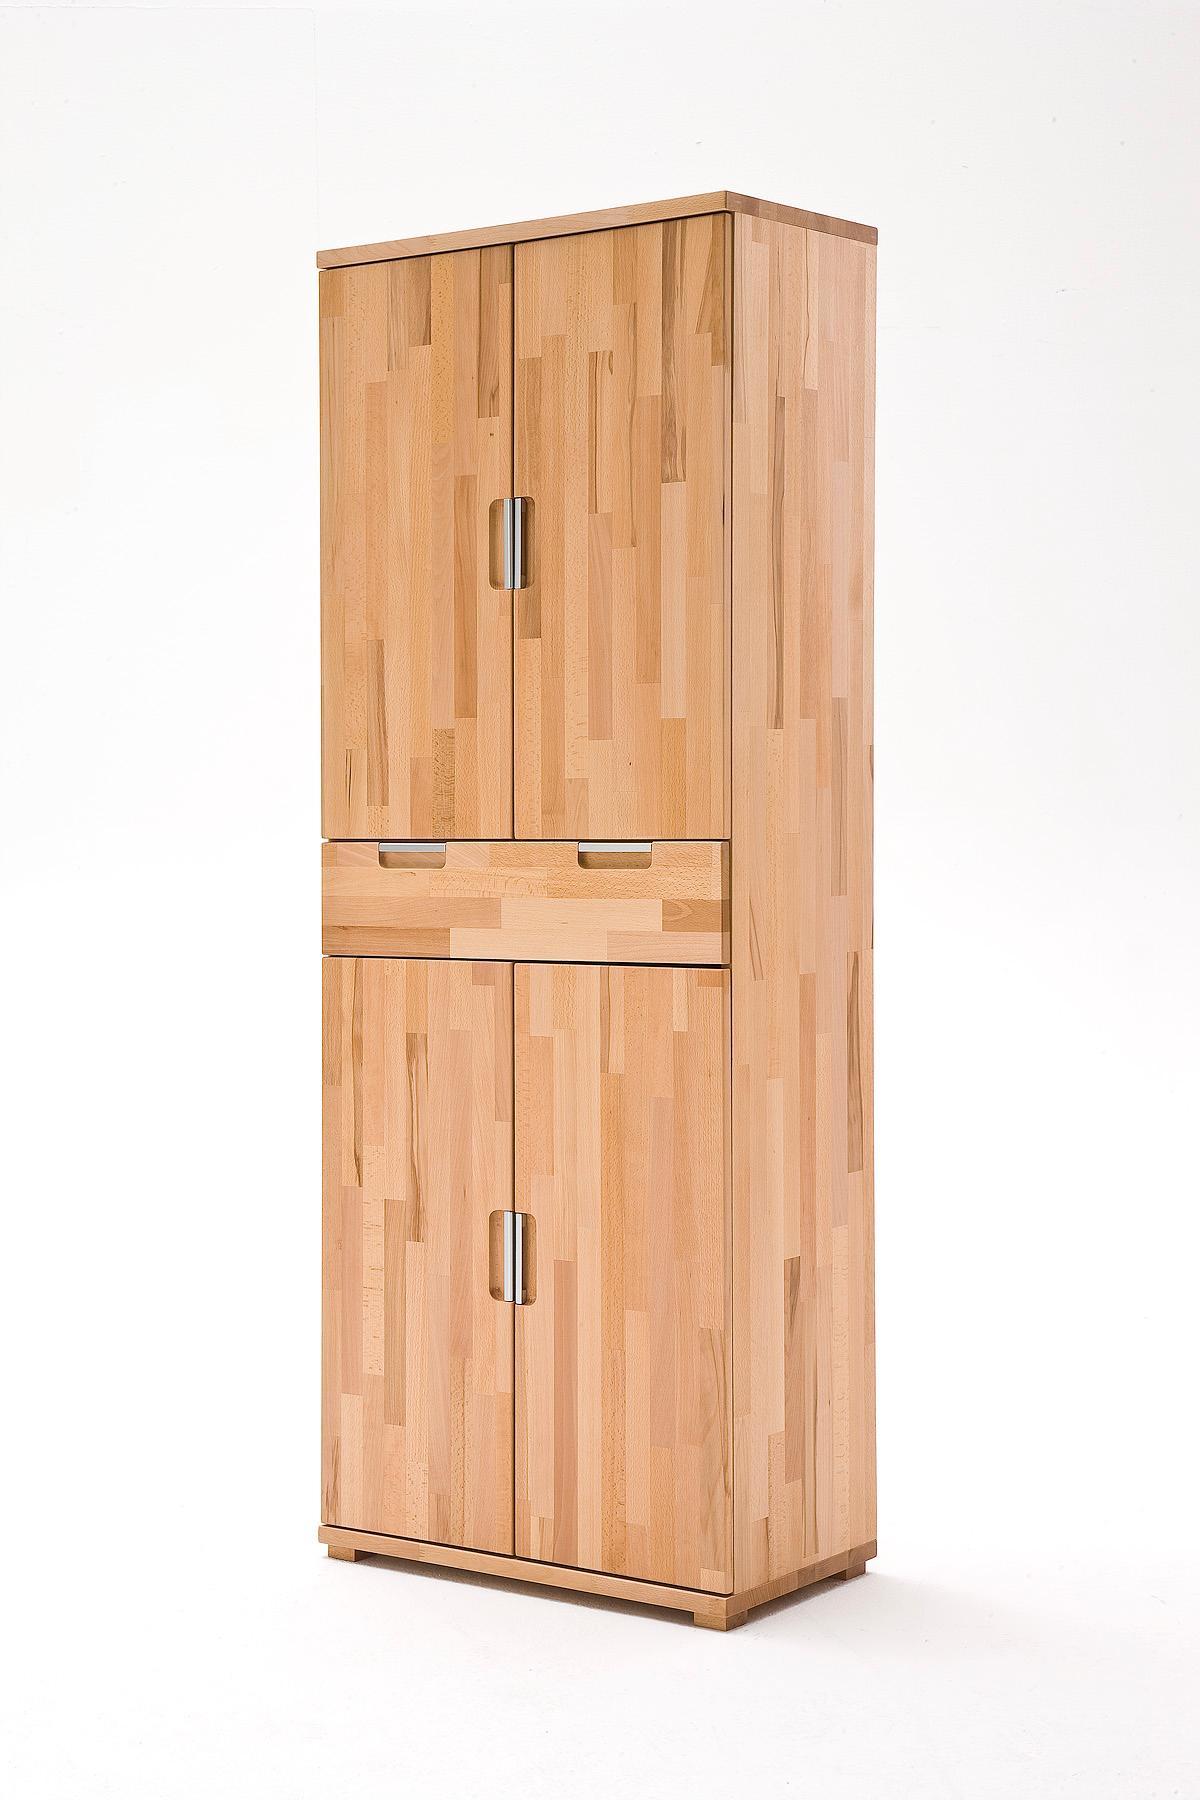 Büroschrank holz  Robas Lund 47303KB1 Büroschrank, Holz, braun, 90 x 40 x 19 cm ...